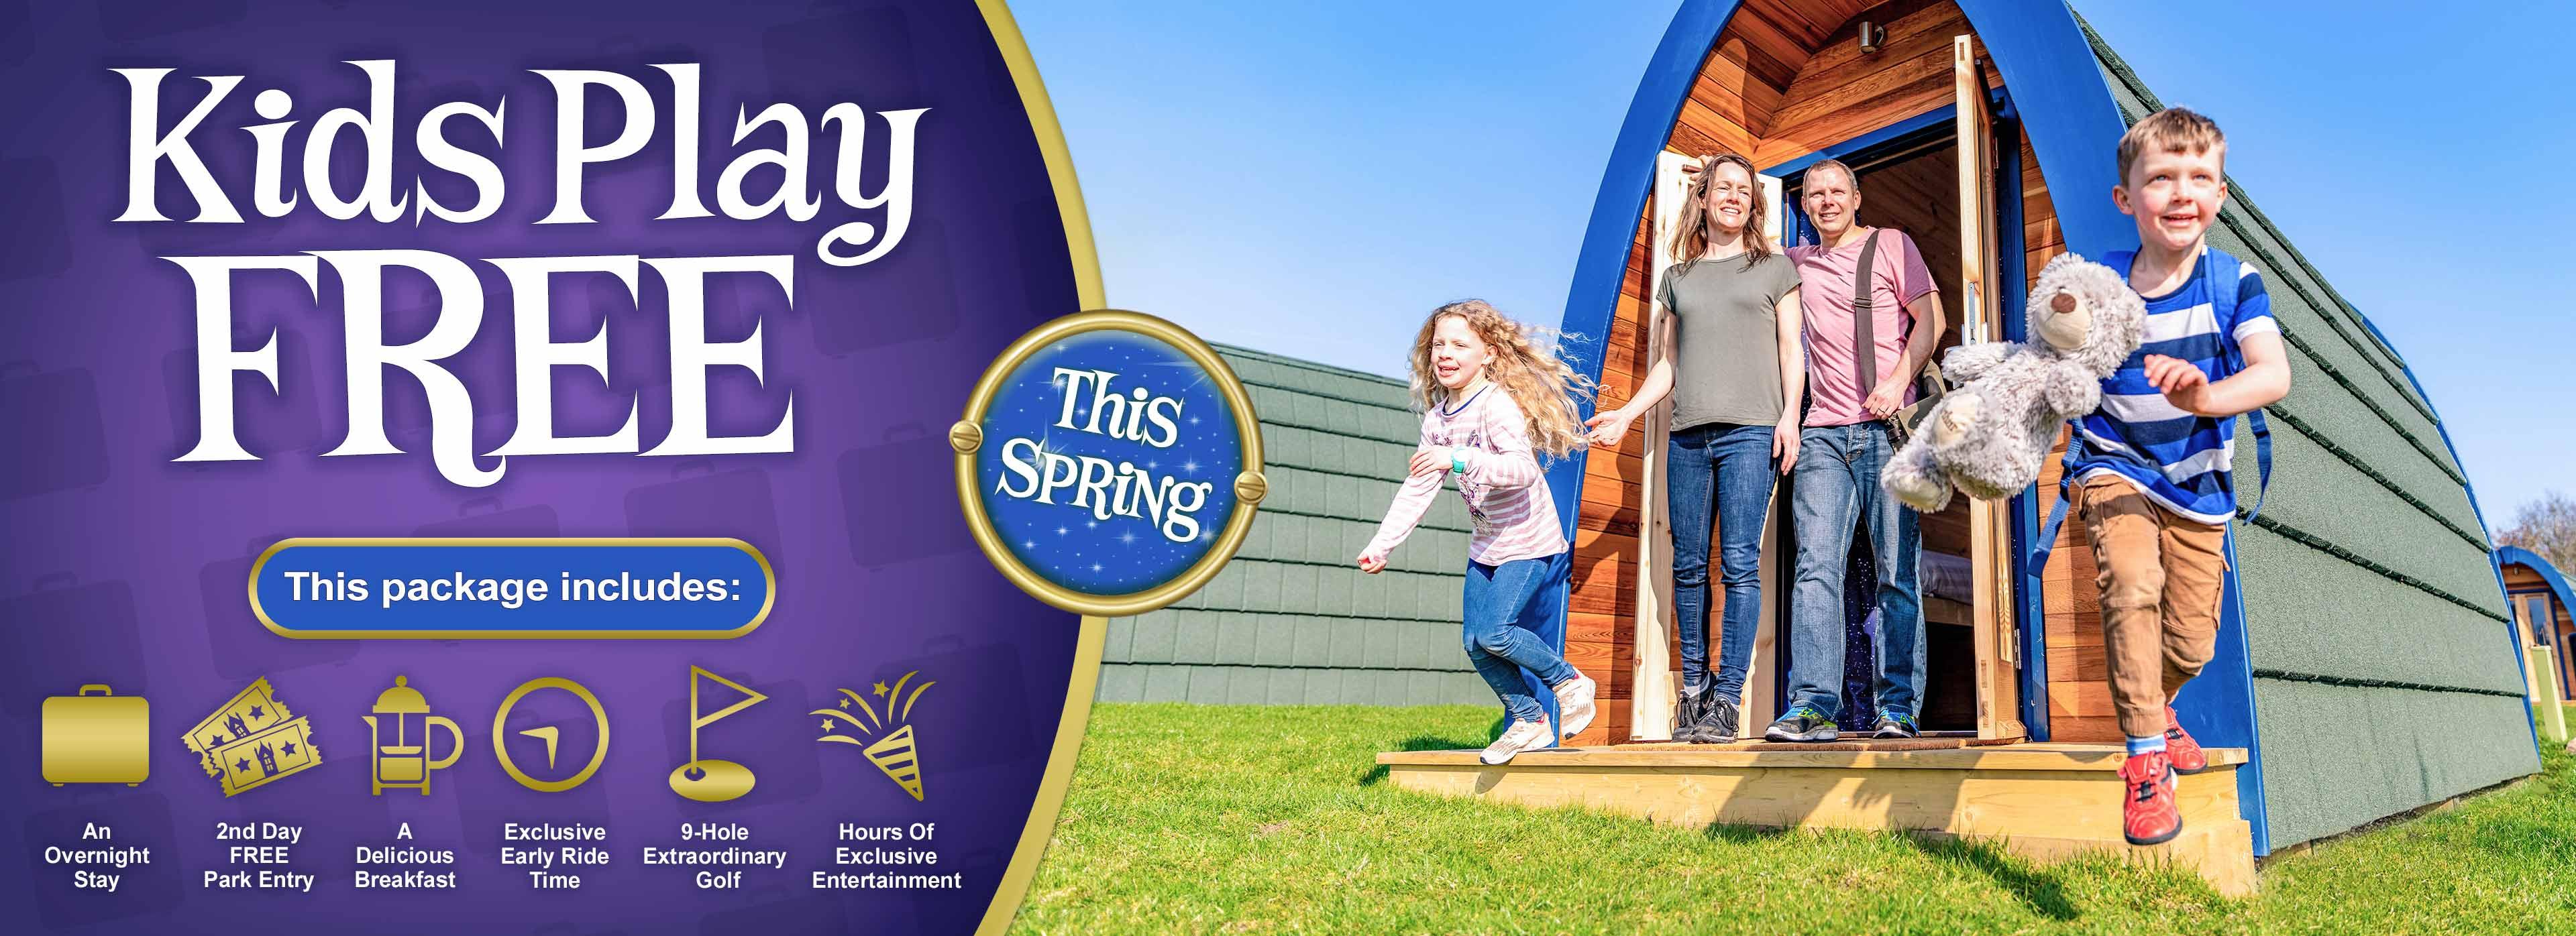 Kids Play FREE this May Half Term at Alton Towers Holidays